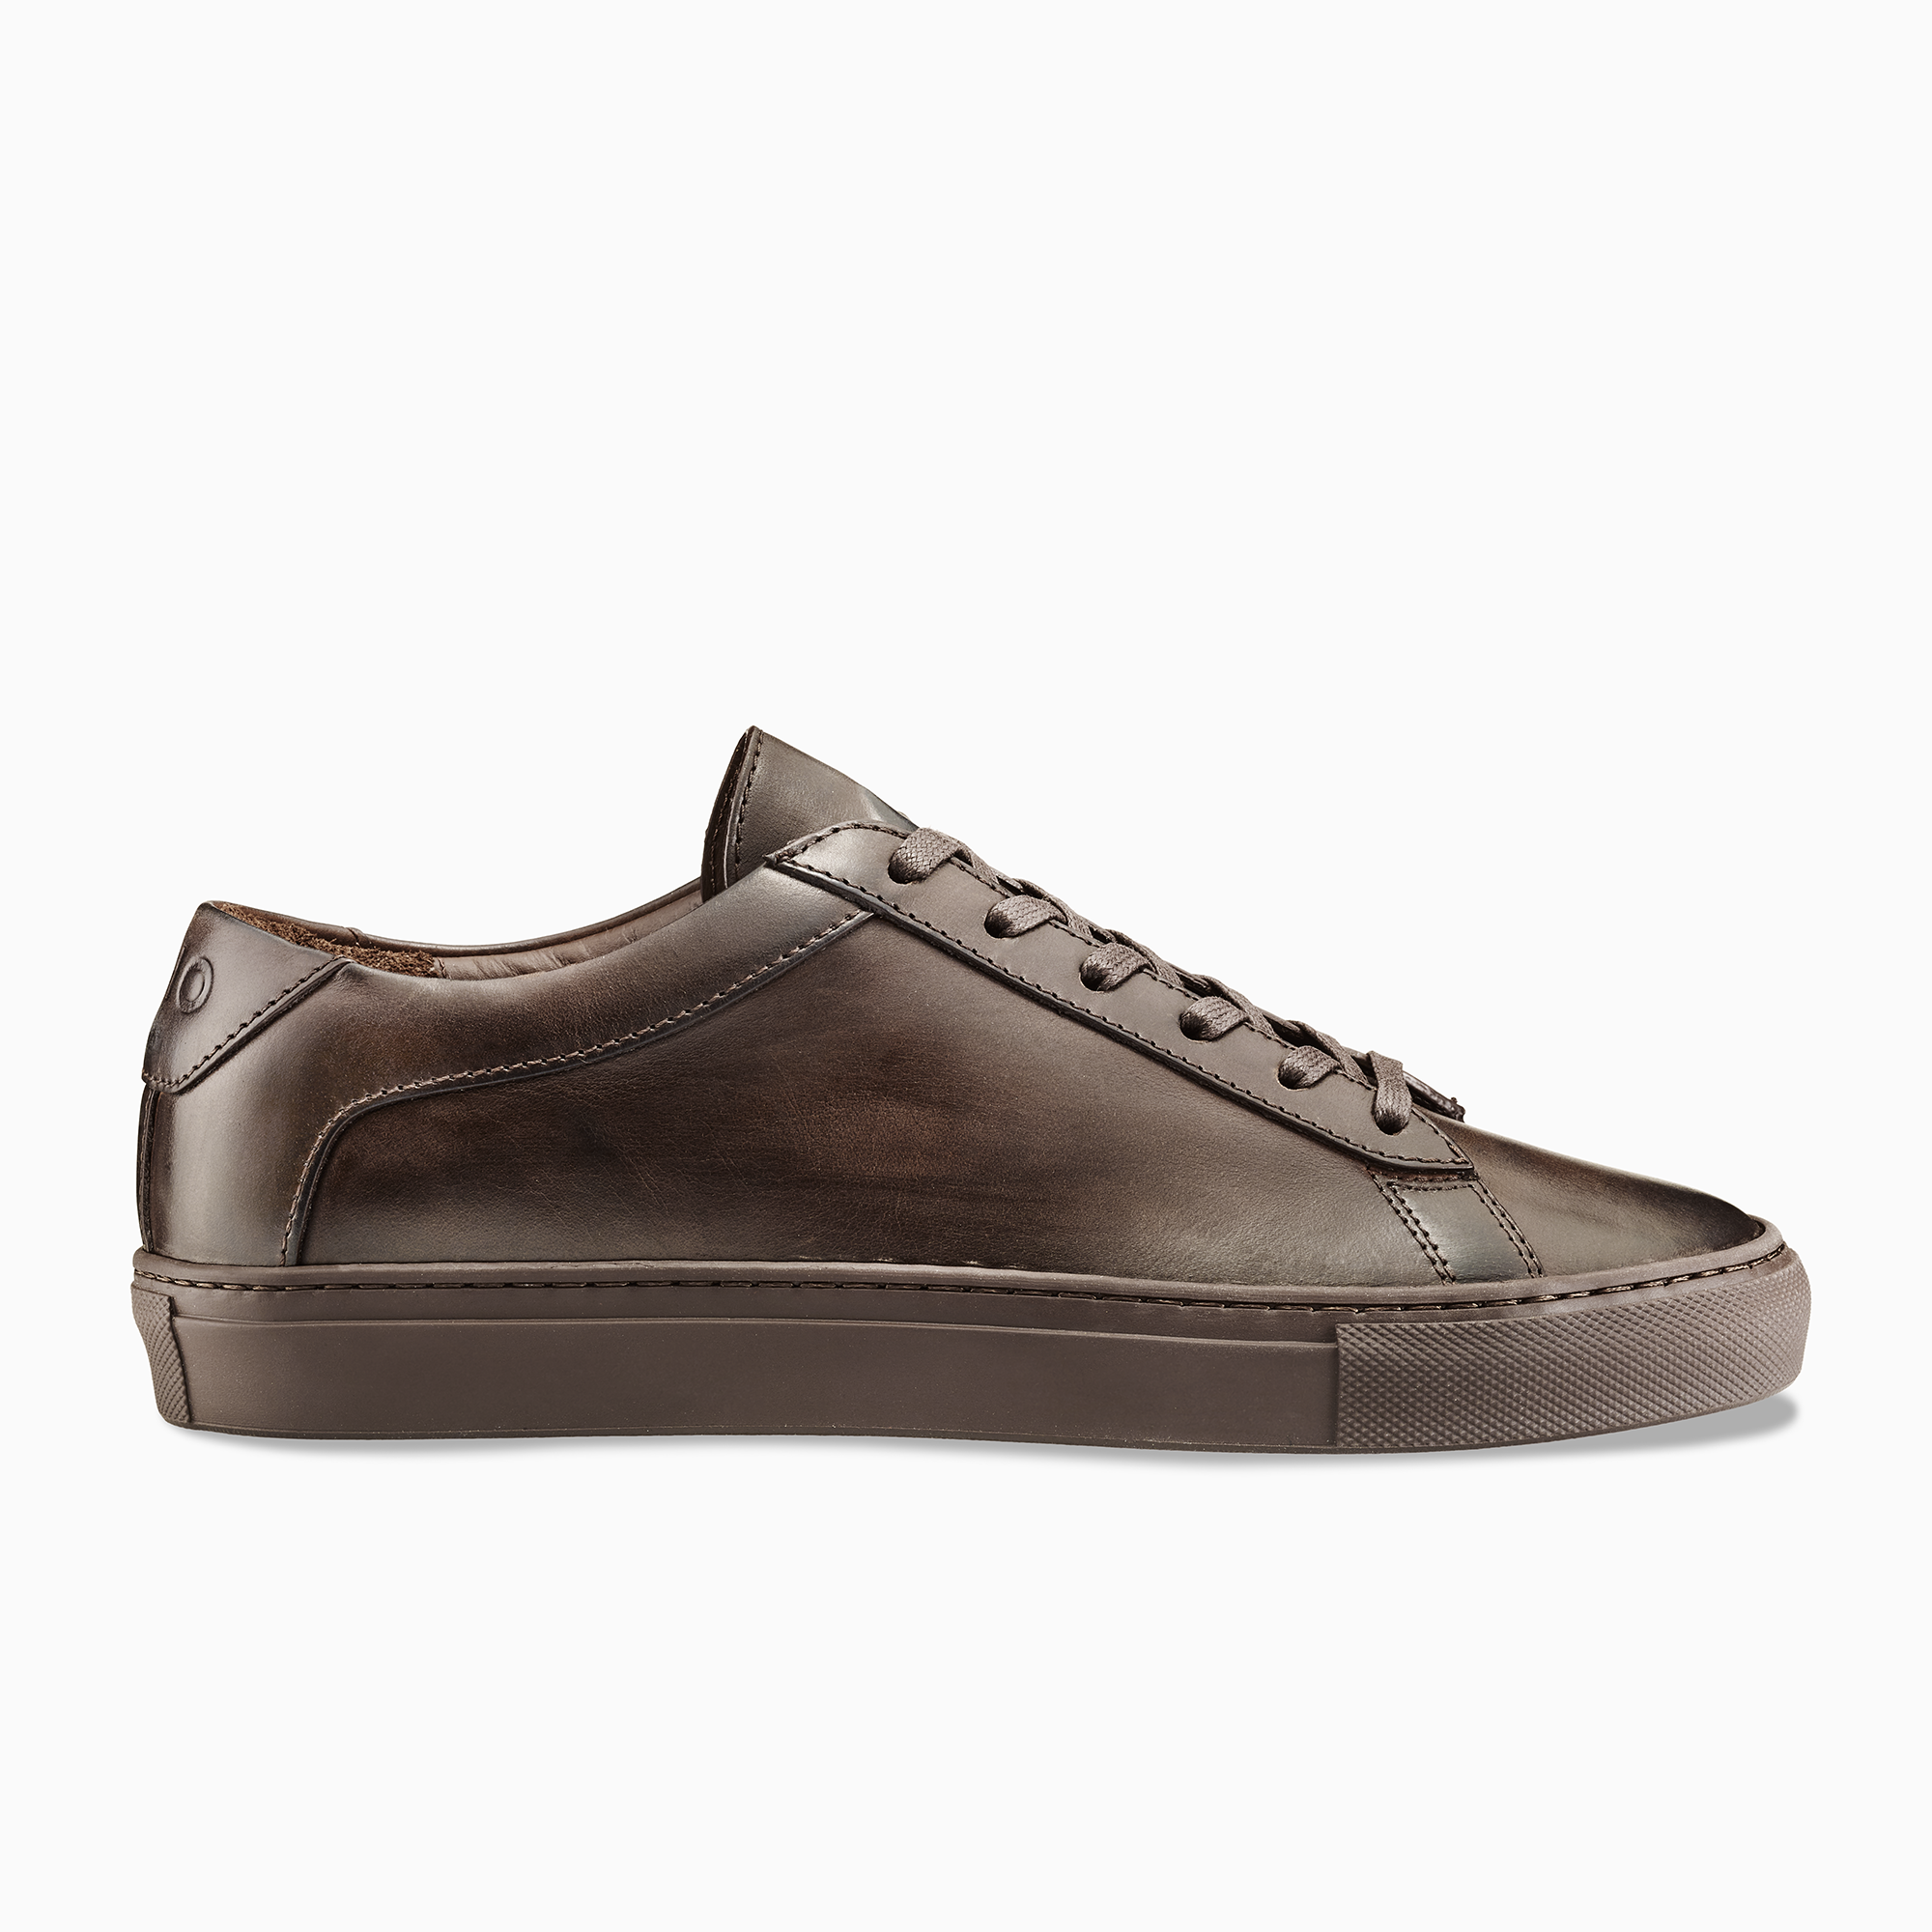 Capri Mocha By Koio Leather Sneakers Men Brown Leather Sneakers Womens Sneakers [ 2000 x 2000 Pixel ]